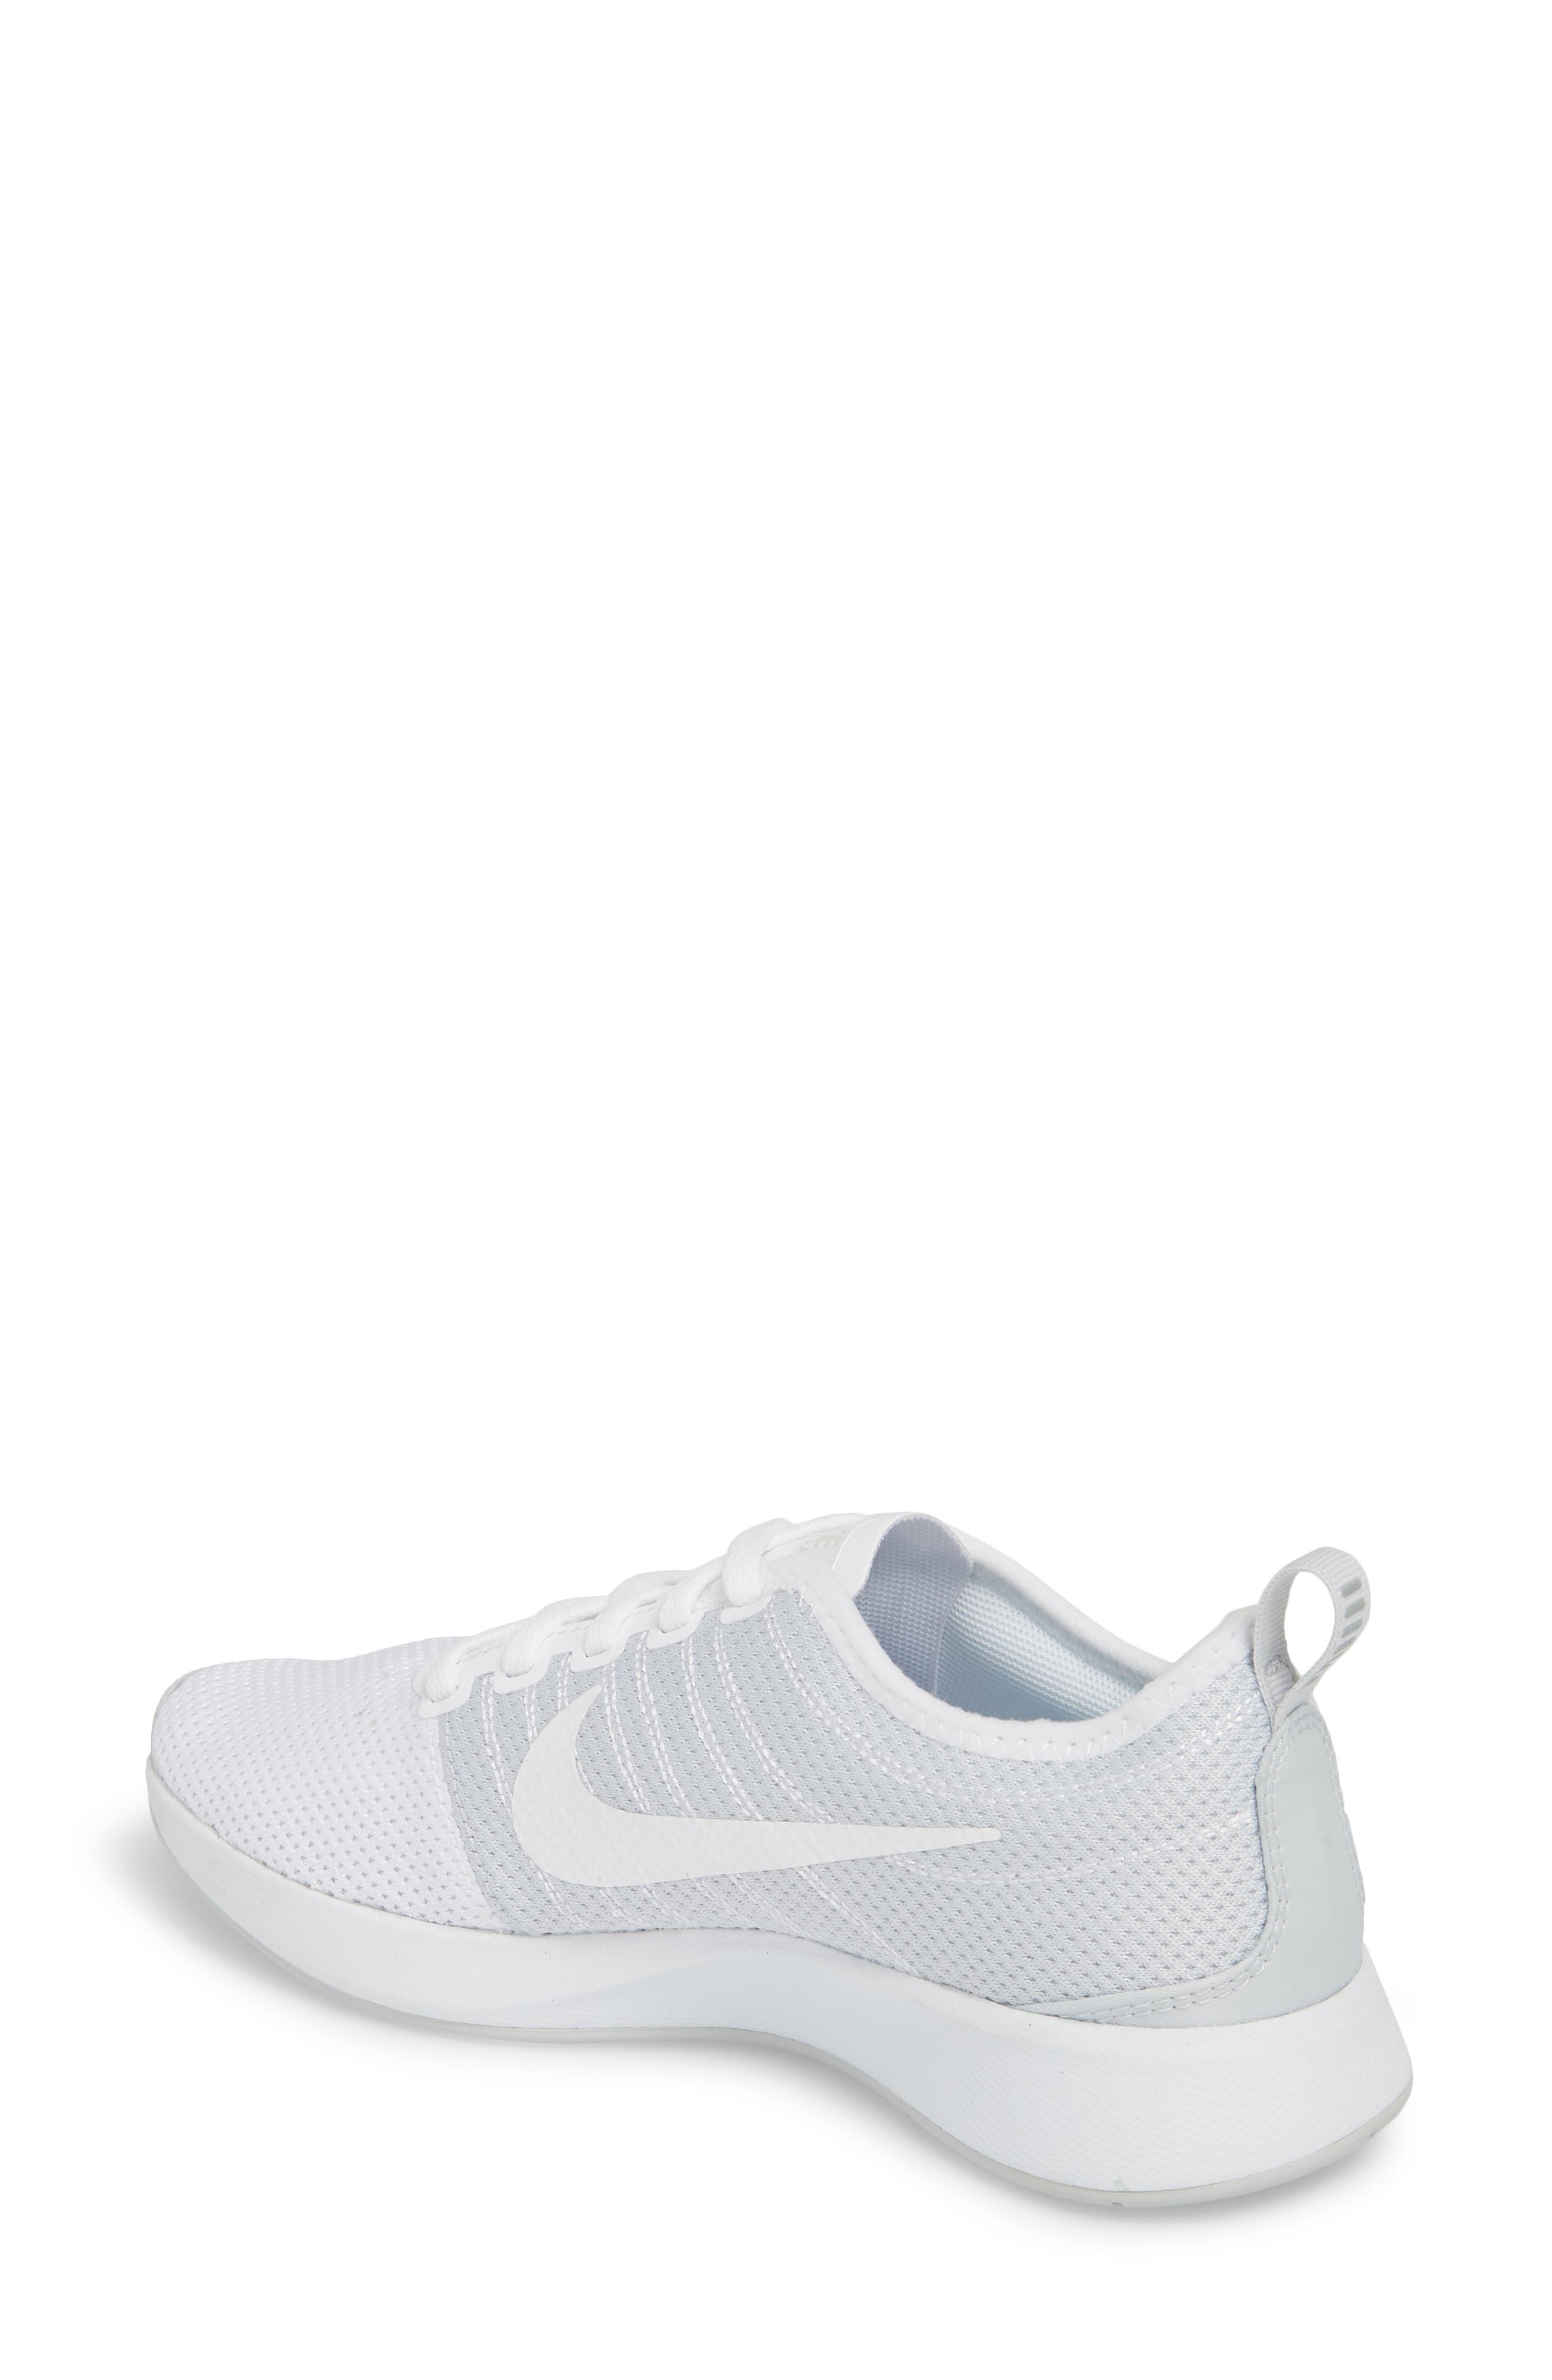 Dualtone Racer Running Shoe,                             Alternate thumbnail 2, color,                             White/ Pure Platinum